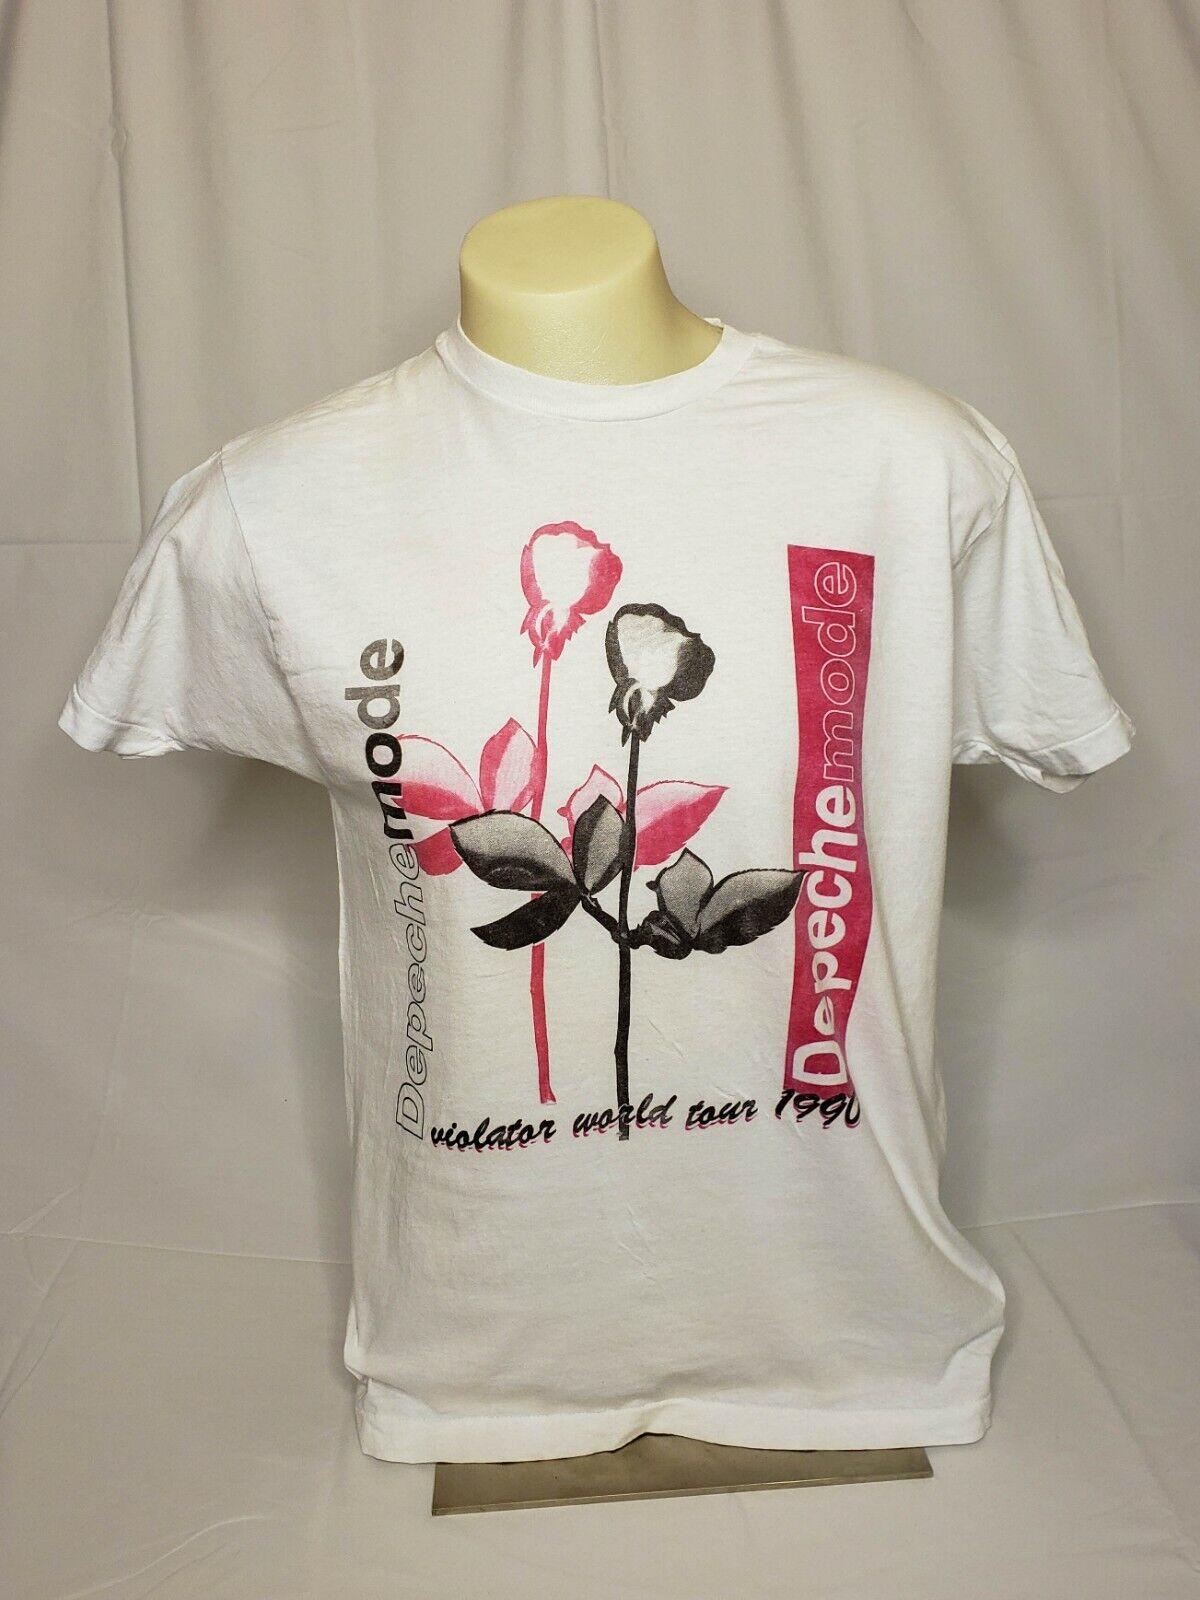 Vintage DEPECHE MODE VIOLATOR 1990 Concert Shirt XL - $129.99